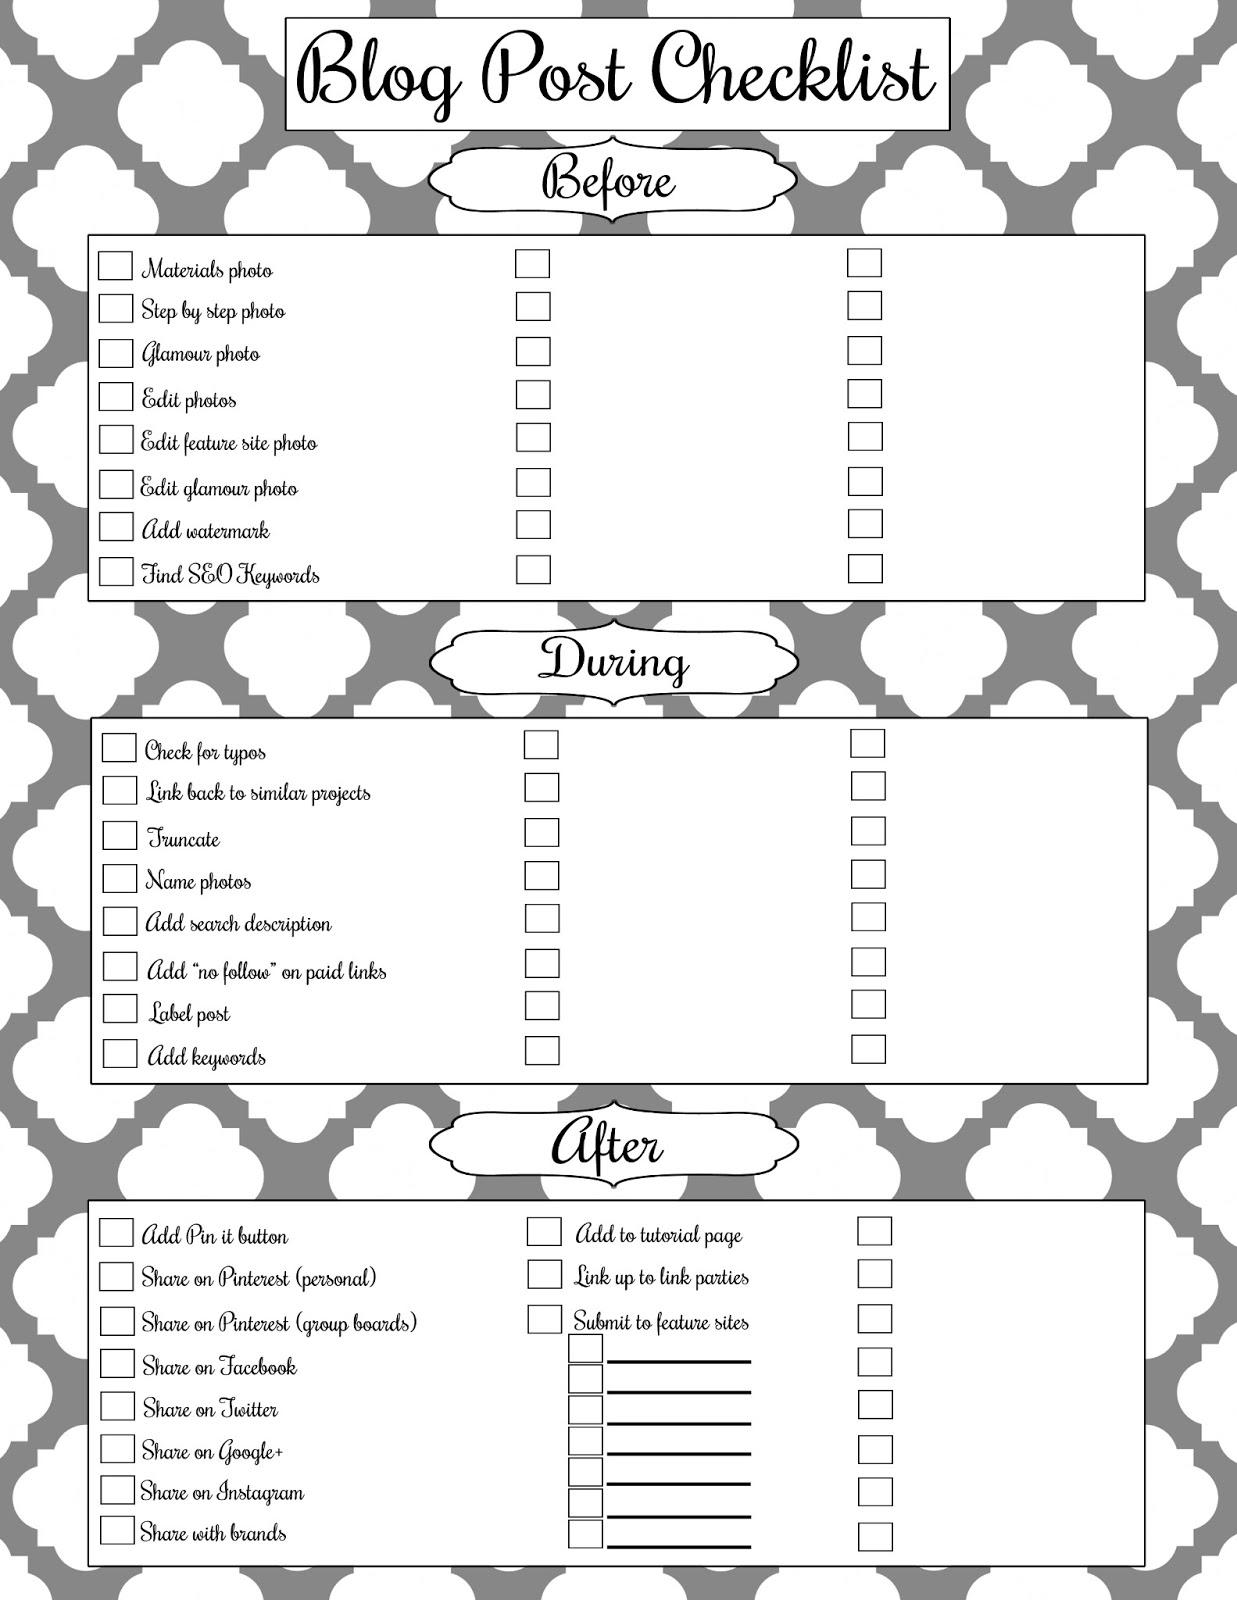 Blog Post Writing Checklist Free Printable! - Girl Loves Glam